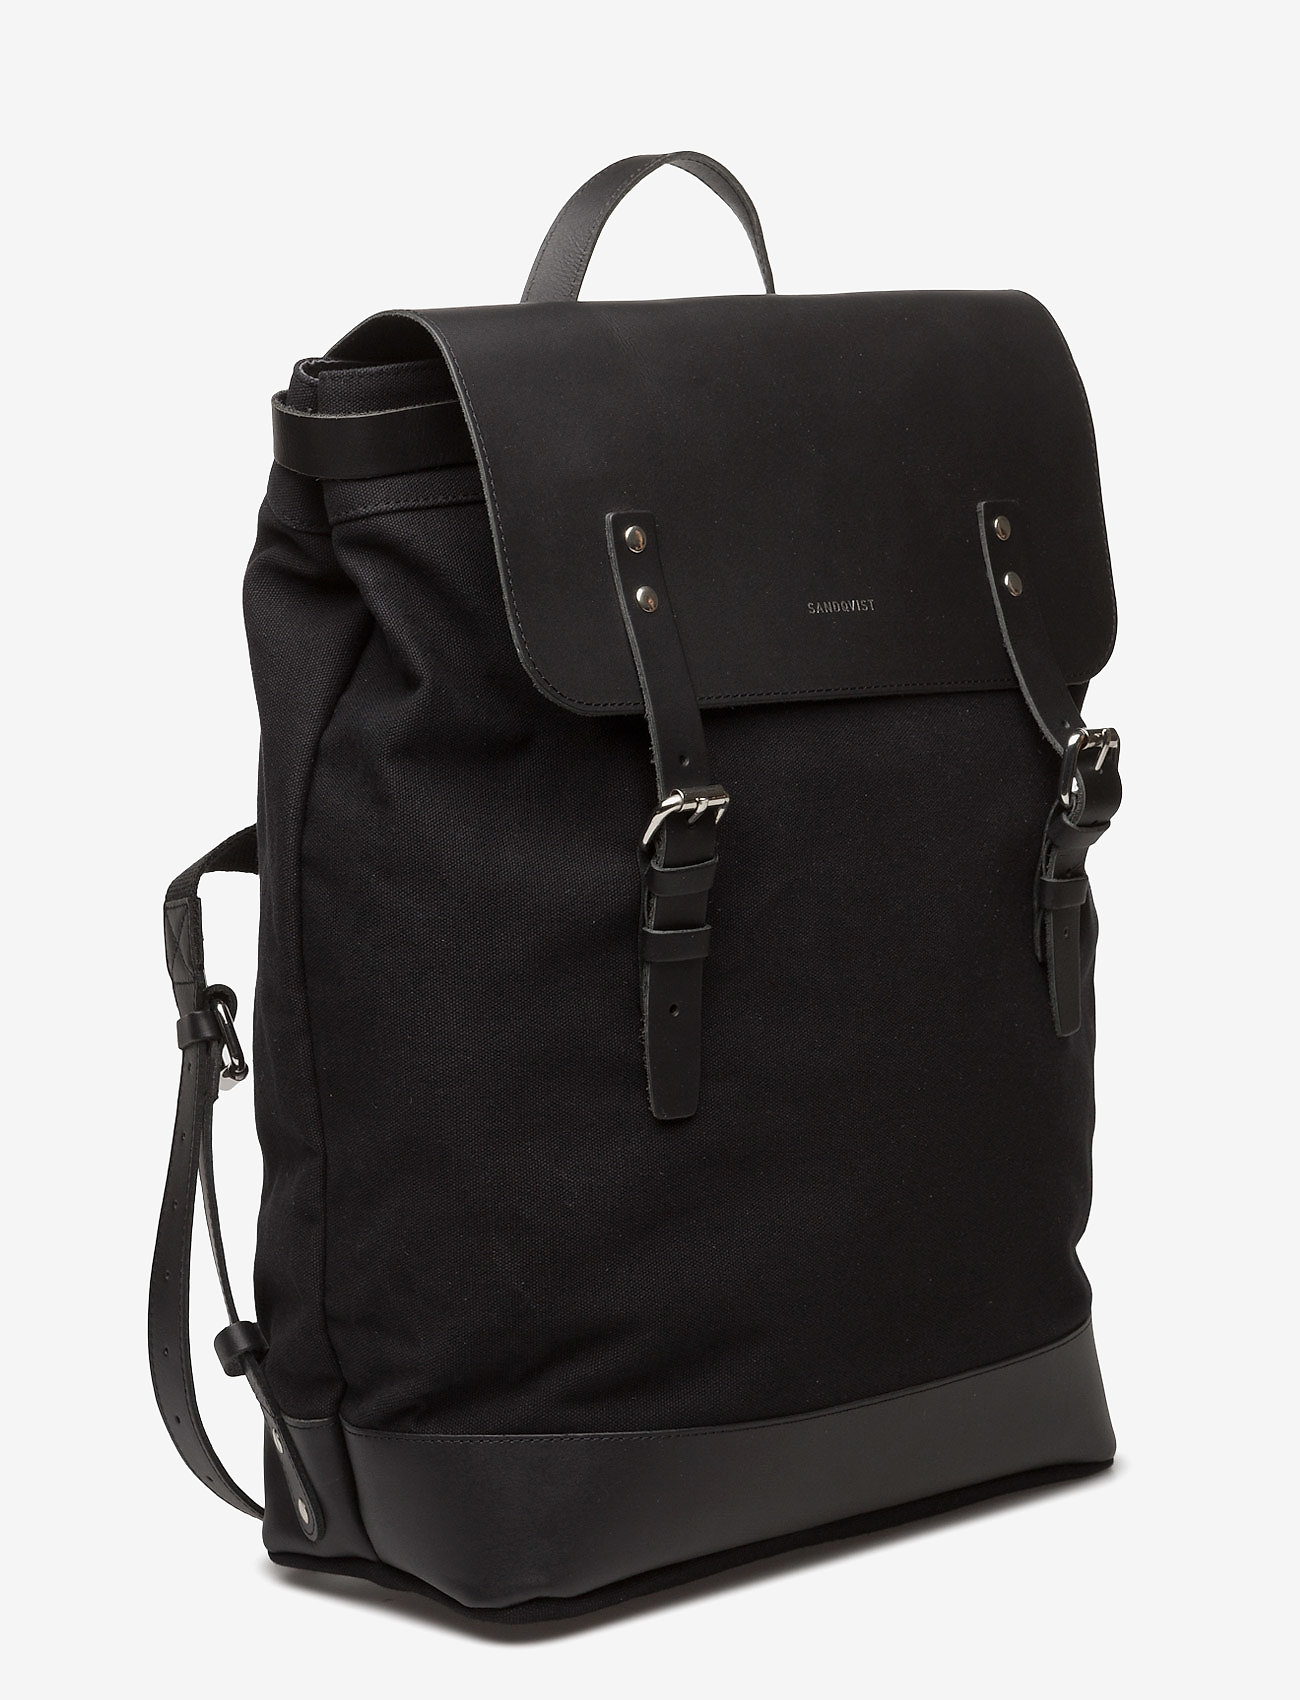 SANDQVIST - HEGE - nieuwe mode - black - 3